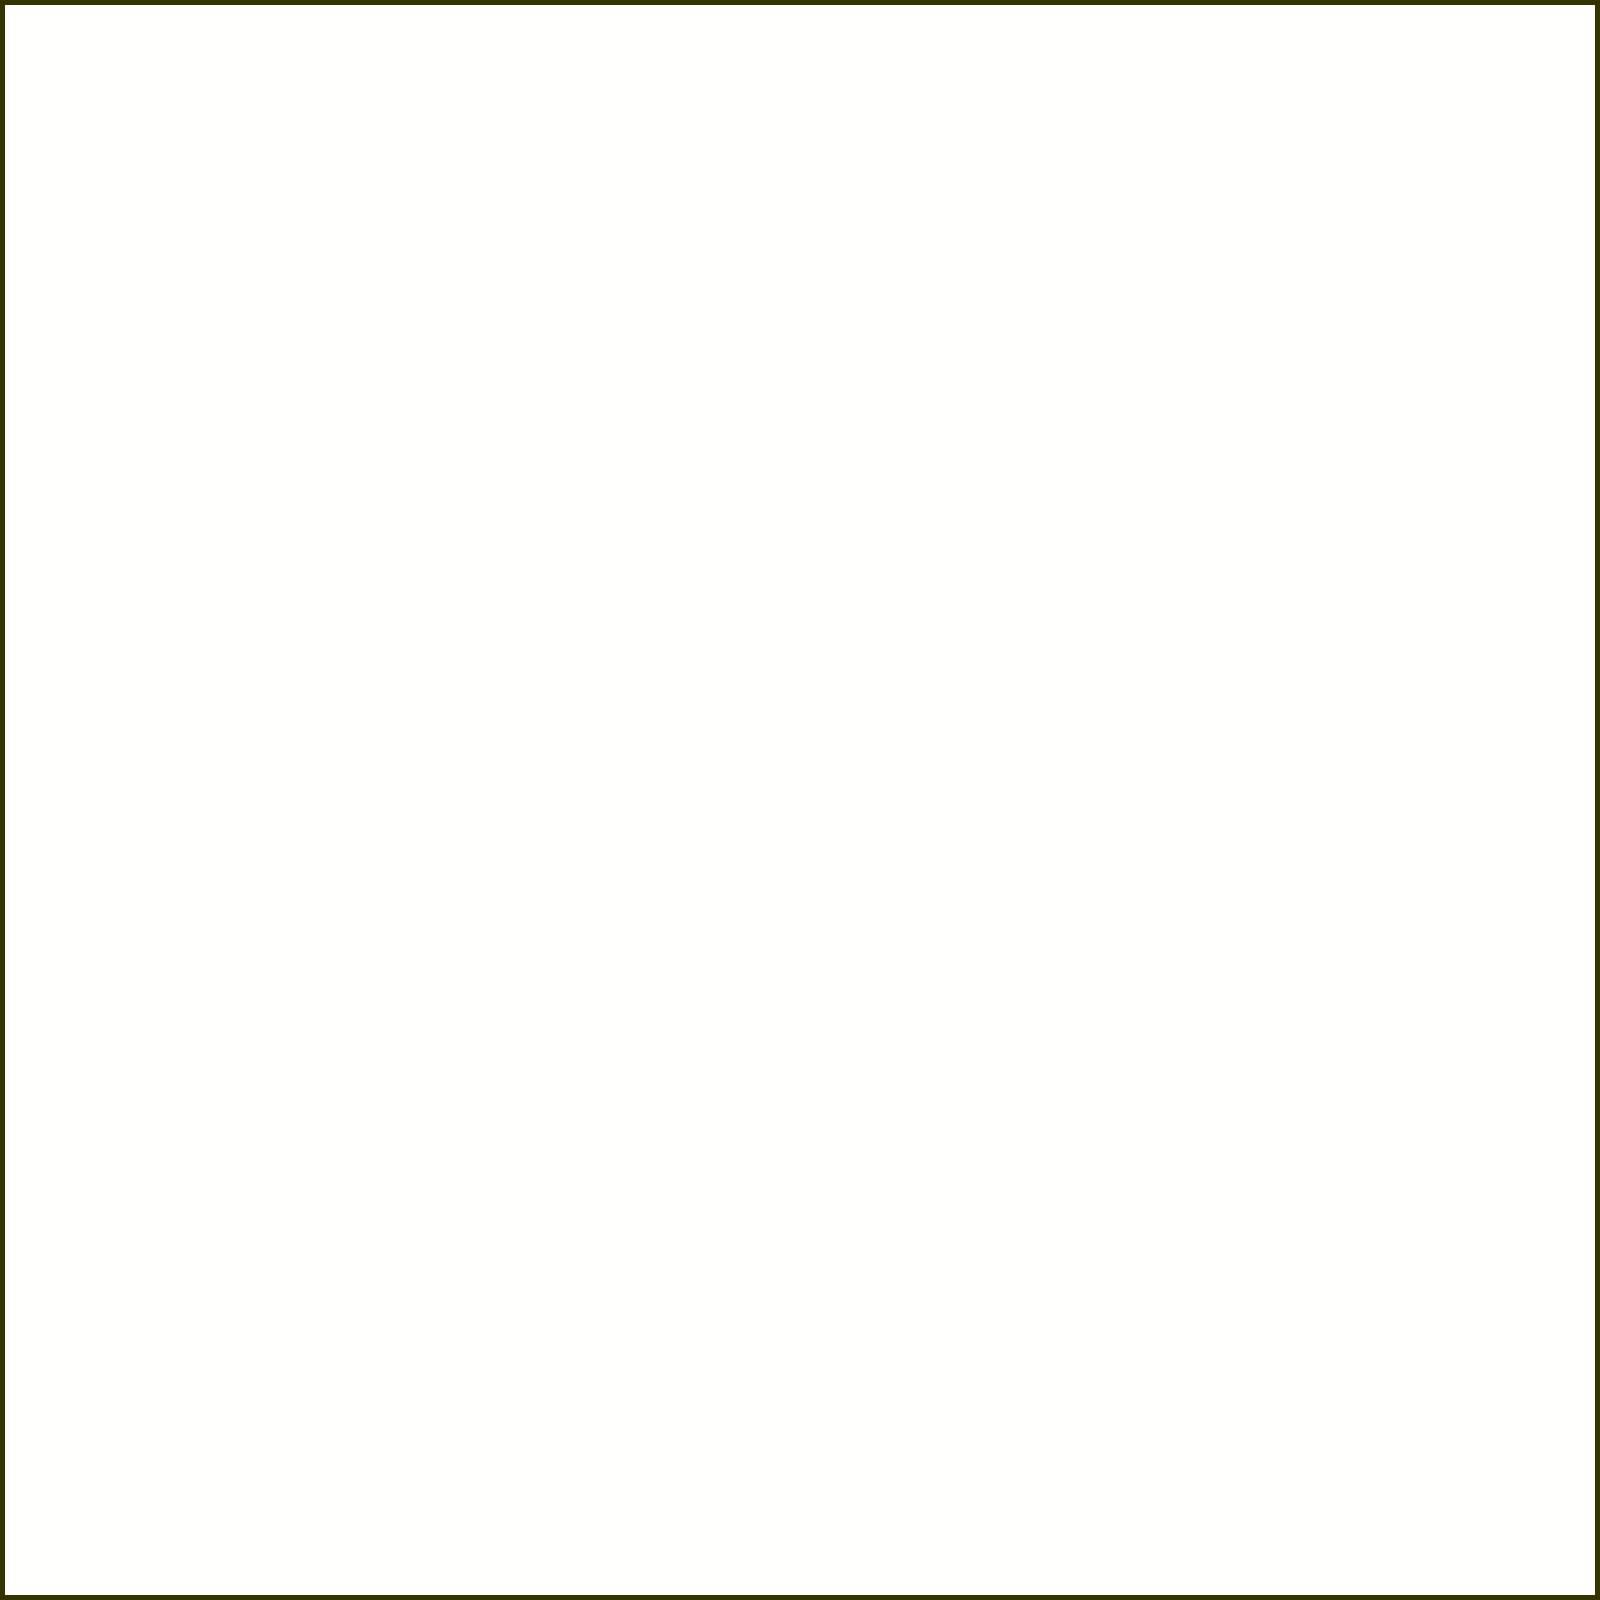 kronotex falquon glamour weiss hochglanz d2935 ohne fase laminat m u s t e r hochglanz 8. Black Bedroom Furniture Sets. Home Design Ideas